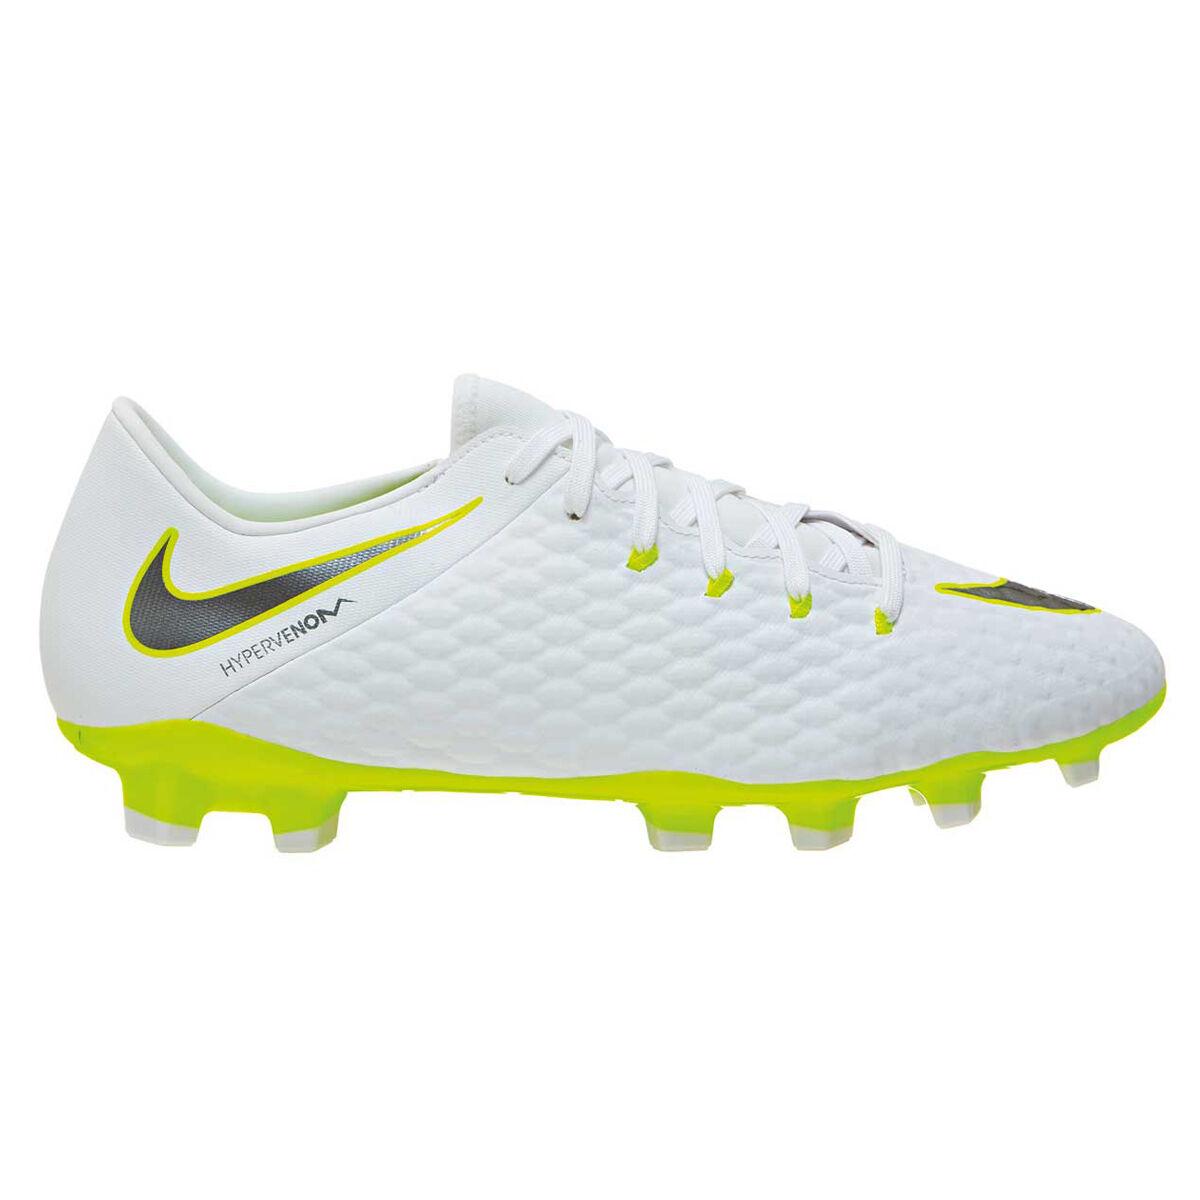 low priced 1f23b 25038 ... denmark nike hypervenom phantom iii academy mens football boots white  grey us 9 white f88a3 d716f